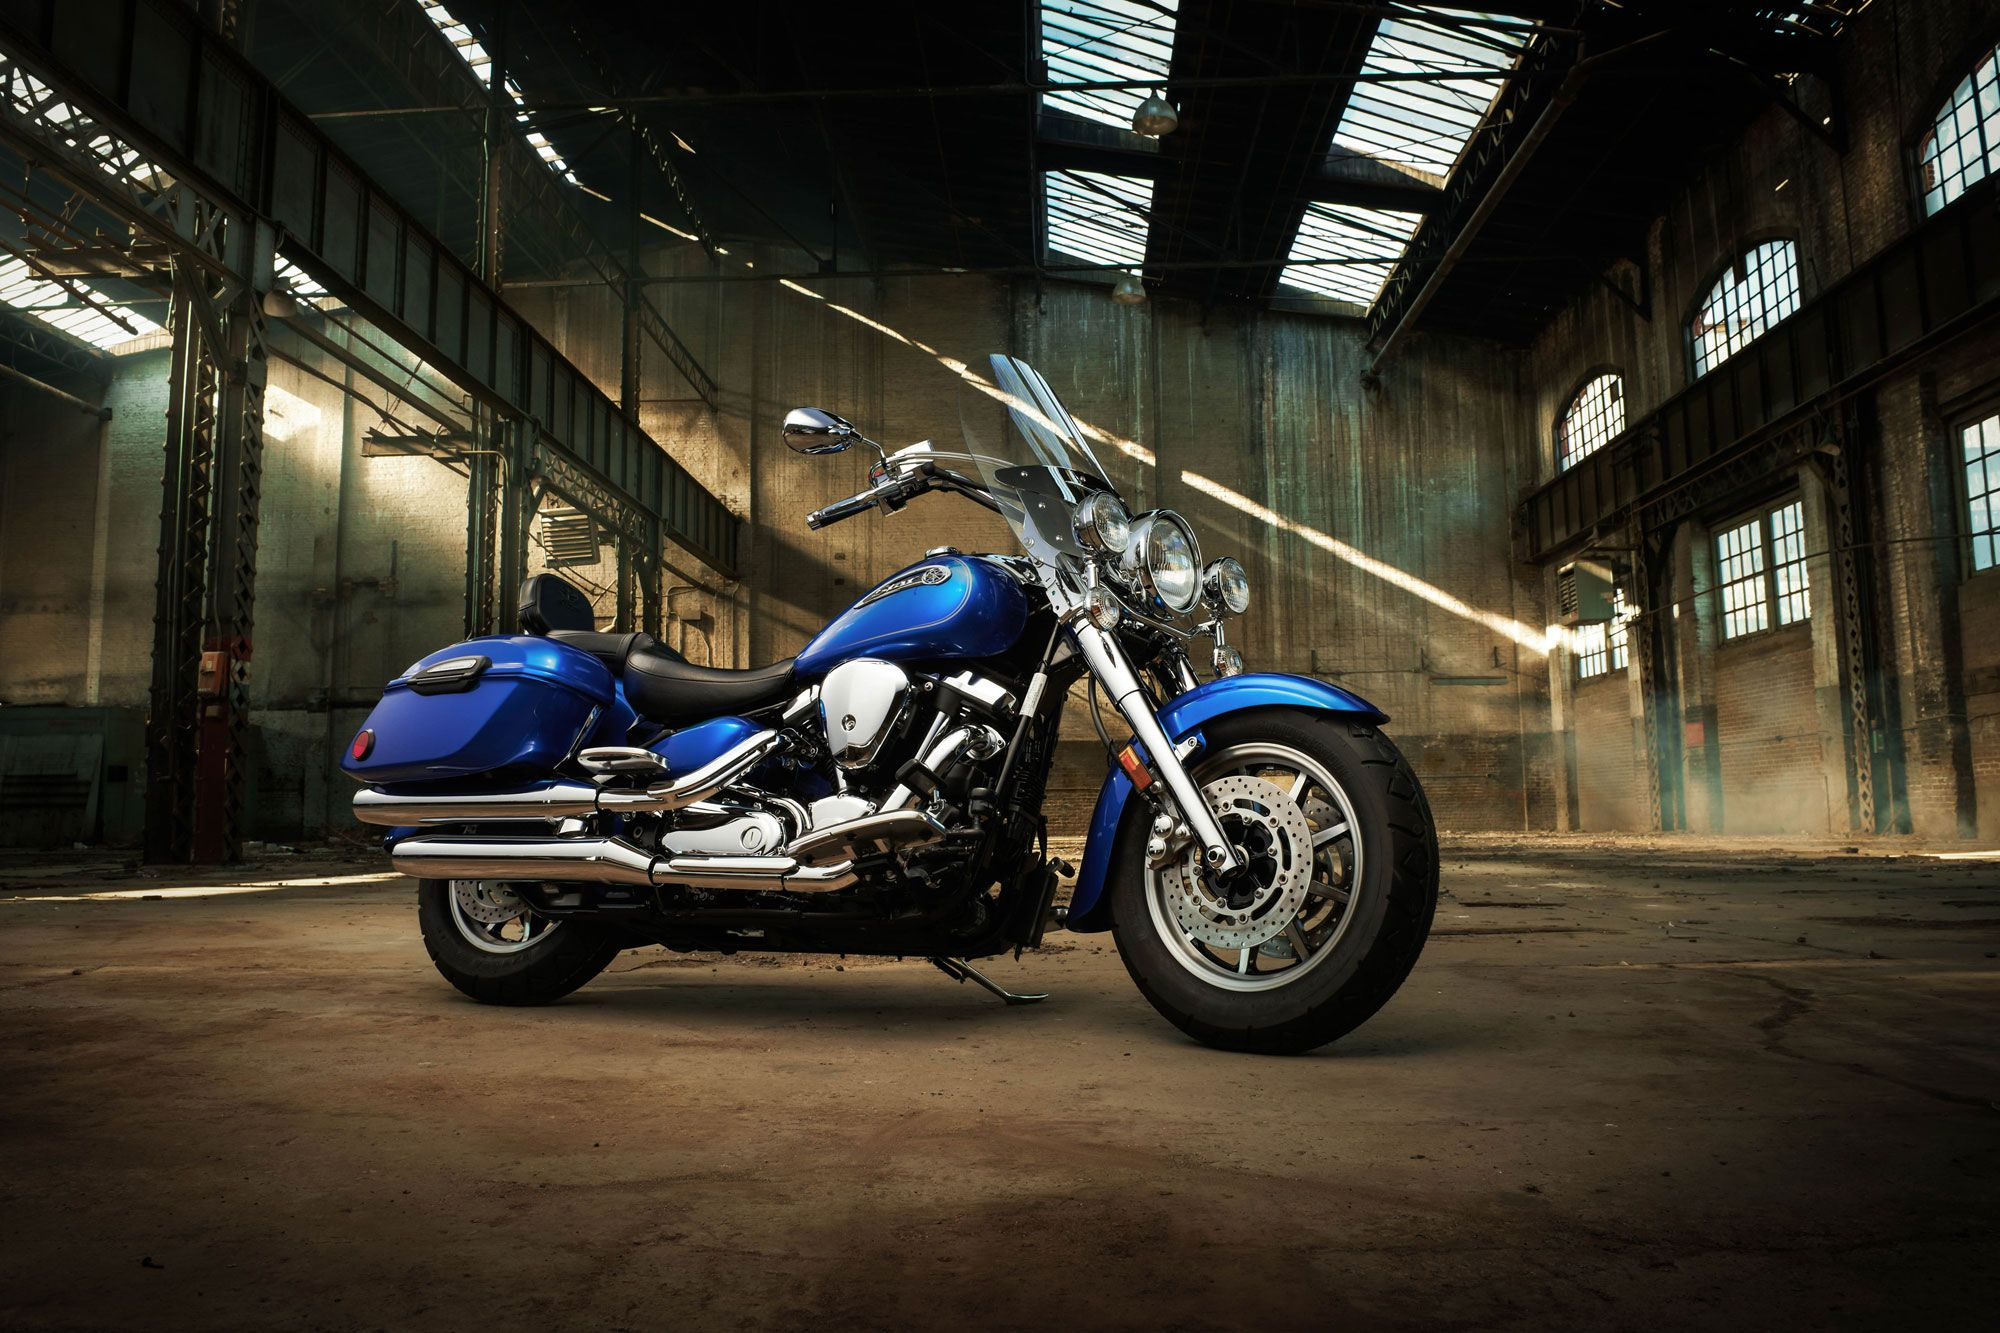 2013 yamaha road star silverado s big bike motorcycles pinterest